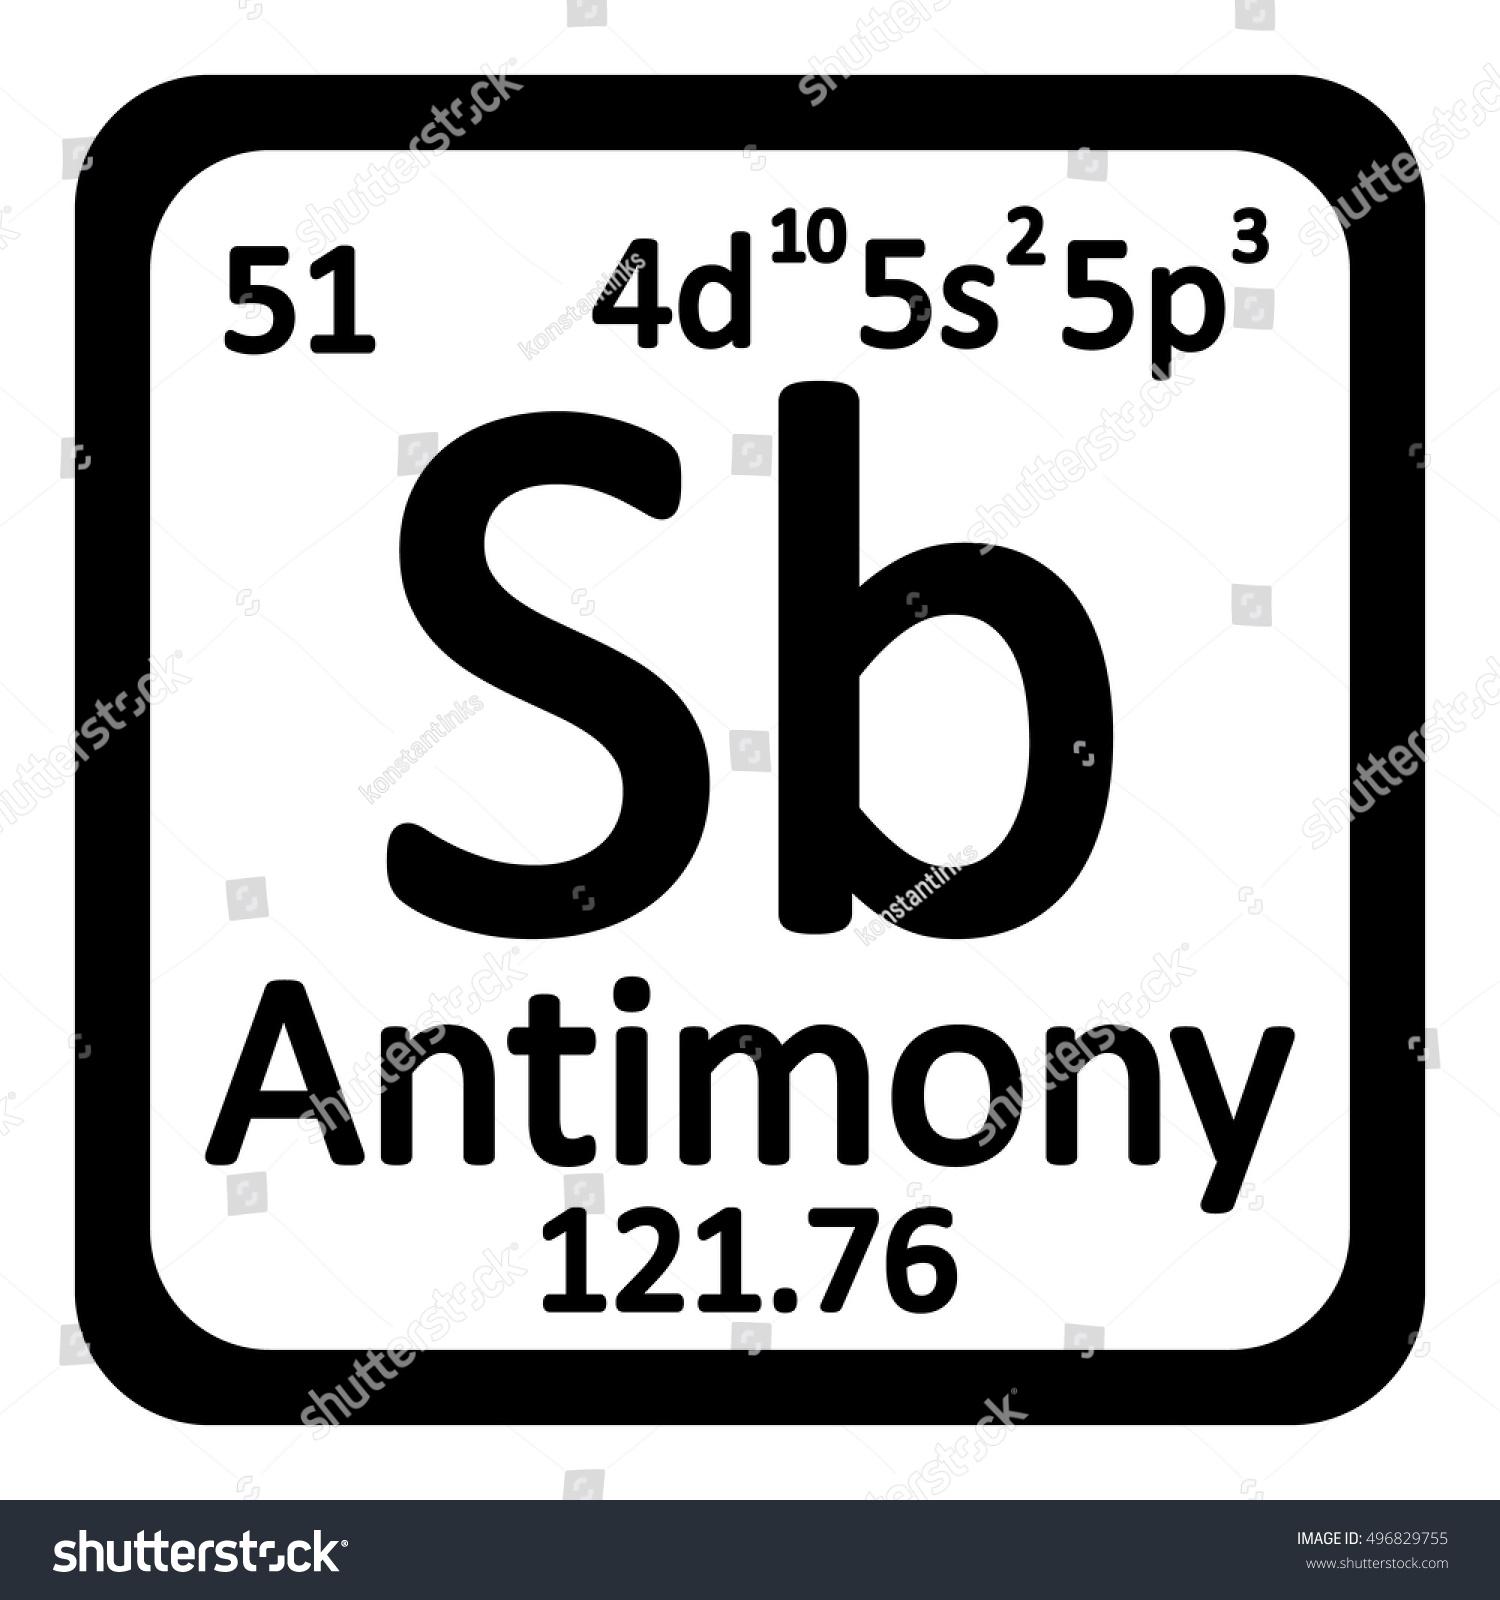 Periodic table element antimony icon on stock vector 496829755 periodic table element antimony icon on white background vector illustration gamestrikefo Choice Image